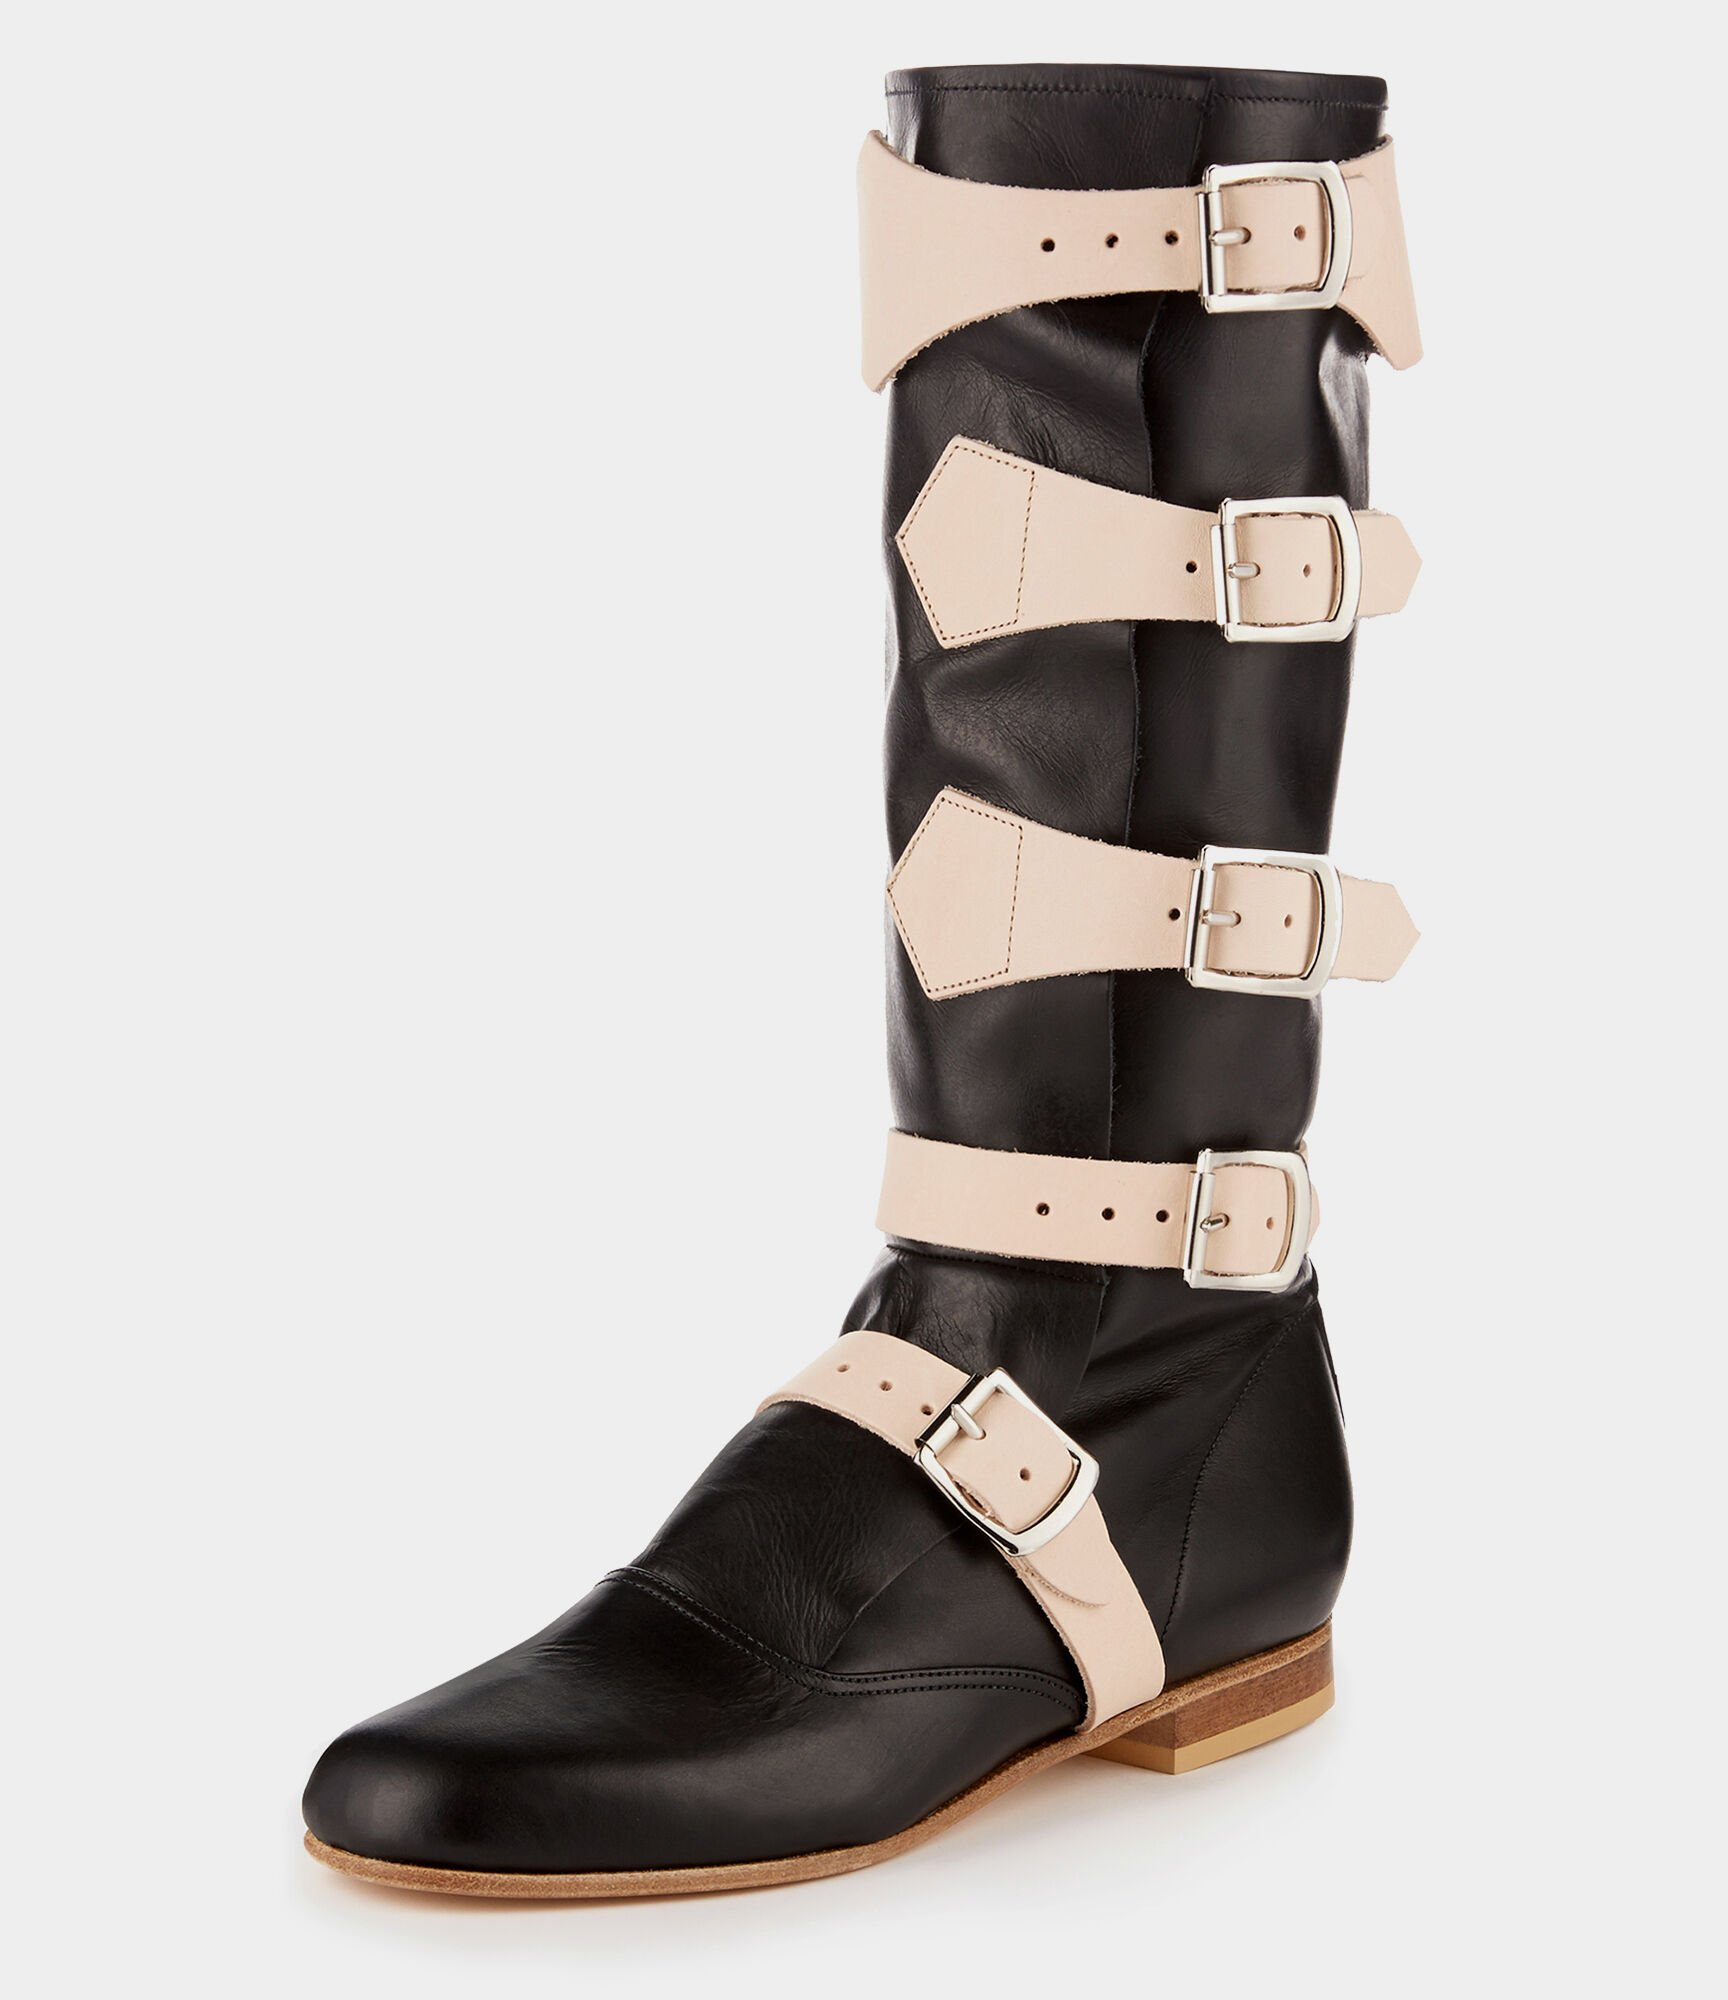 Pirate Boot | Boots Women | Vivienne